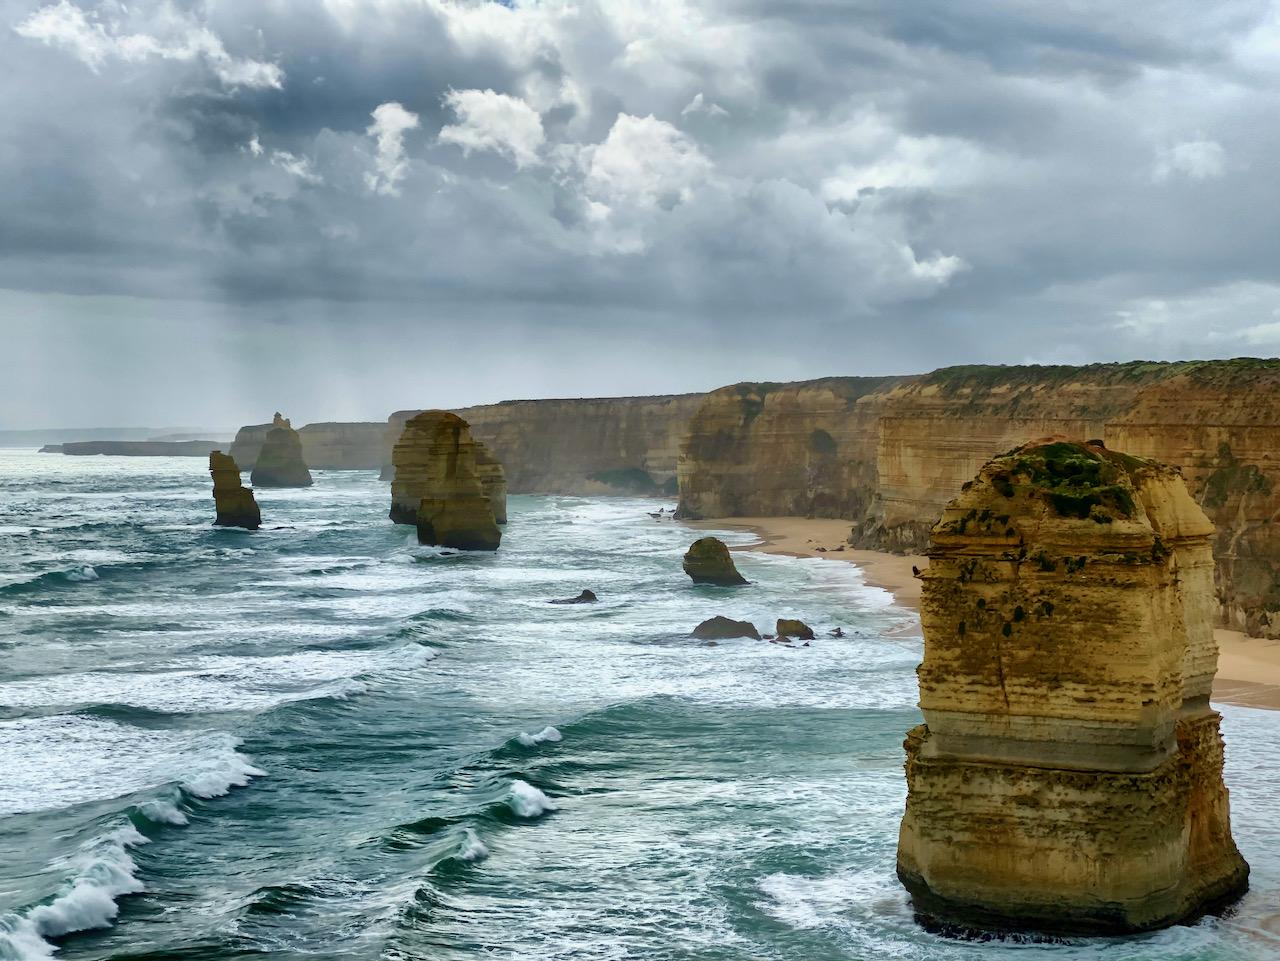 Zwölf Apostel, Great Ocean Road, Port Campbell National Park, Princetown, Victoria, Australien (25.10.2019)